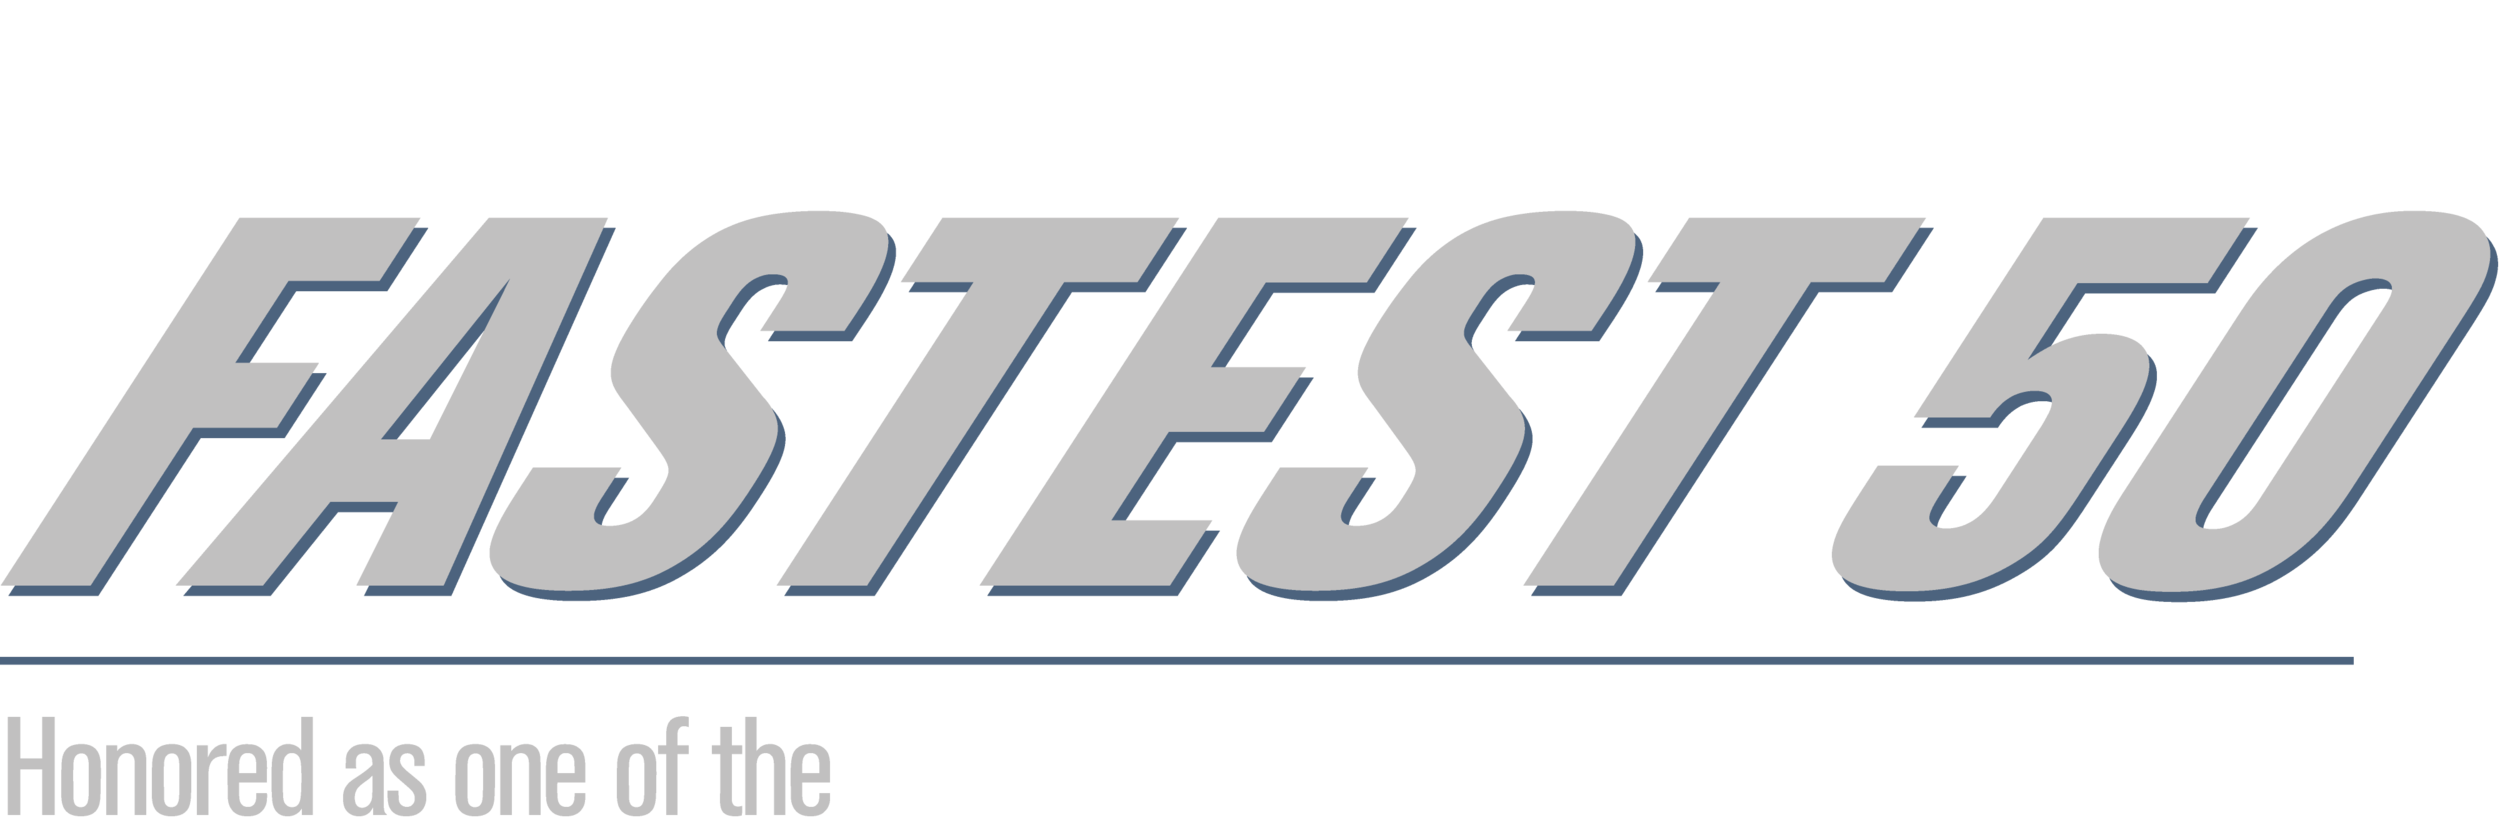 TSE-Fast50HonoreeHorz-Rev-2018.png